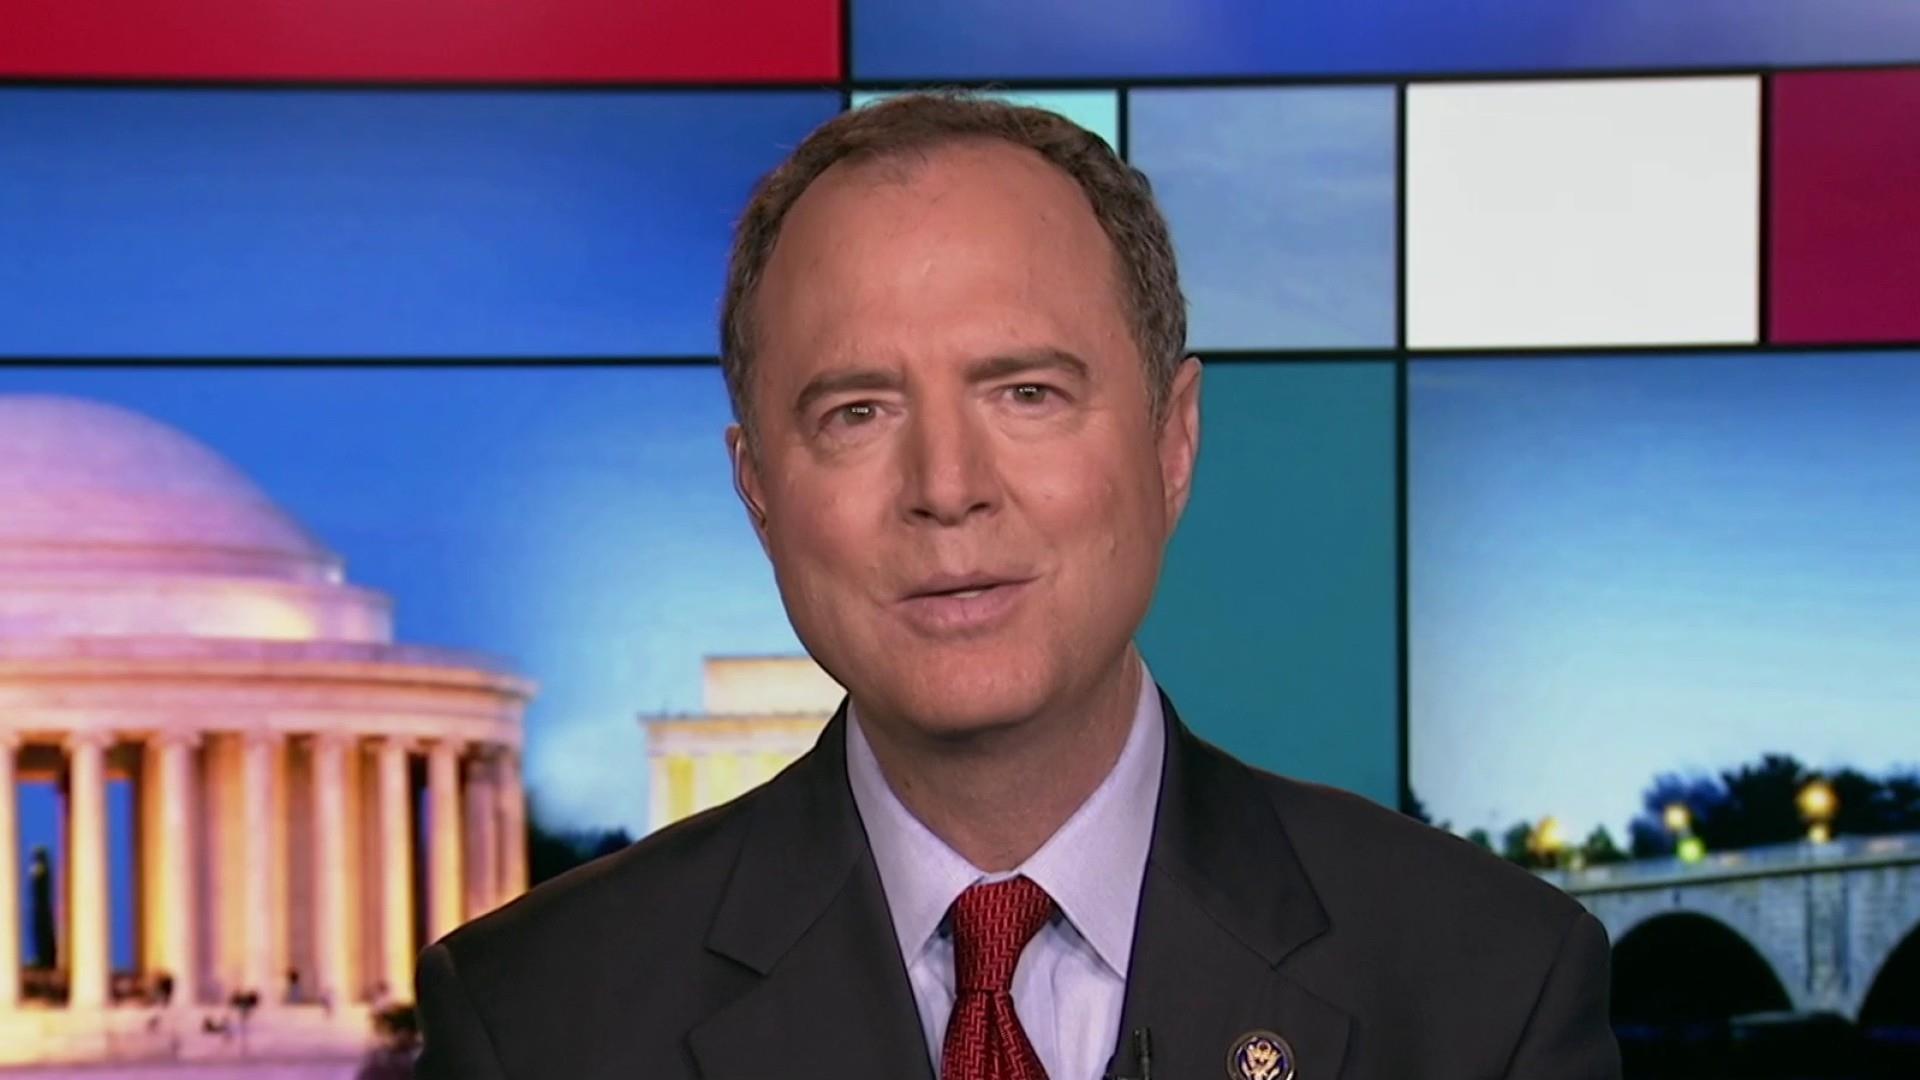 House Intel plans hearings into Trump counterintel findings